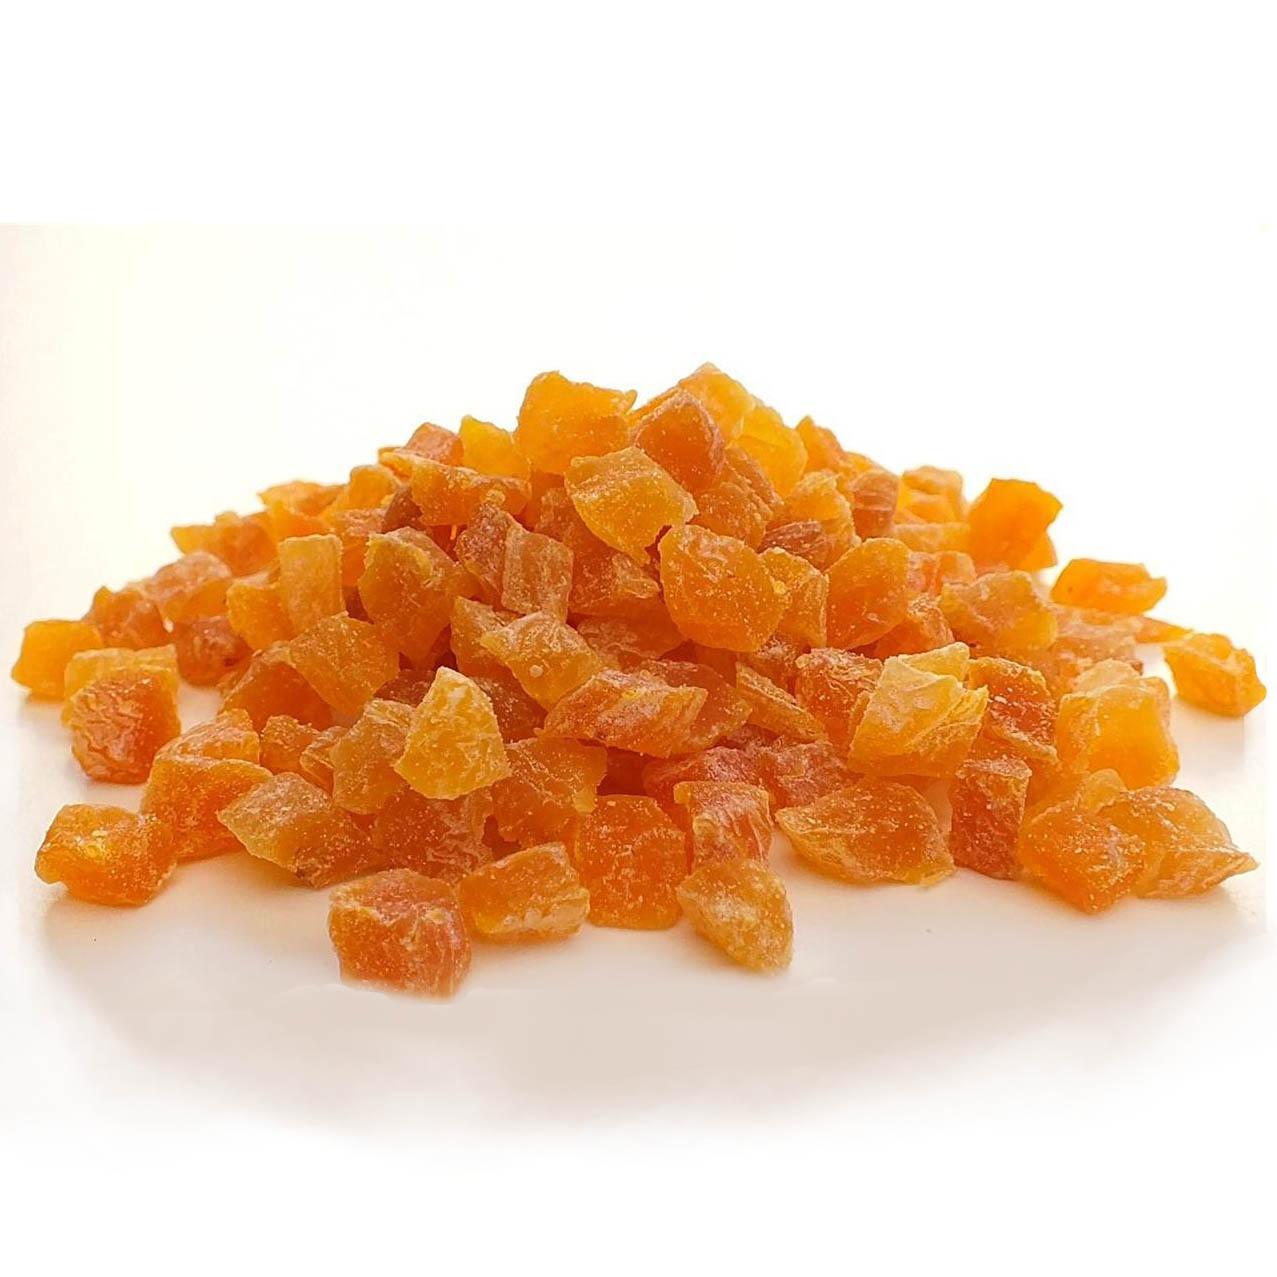 Organic Unsulphured Apricot Pieces